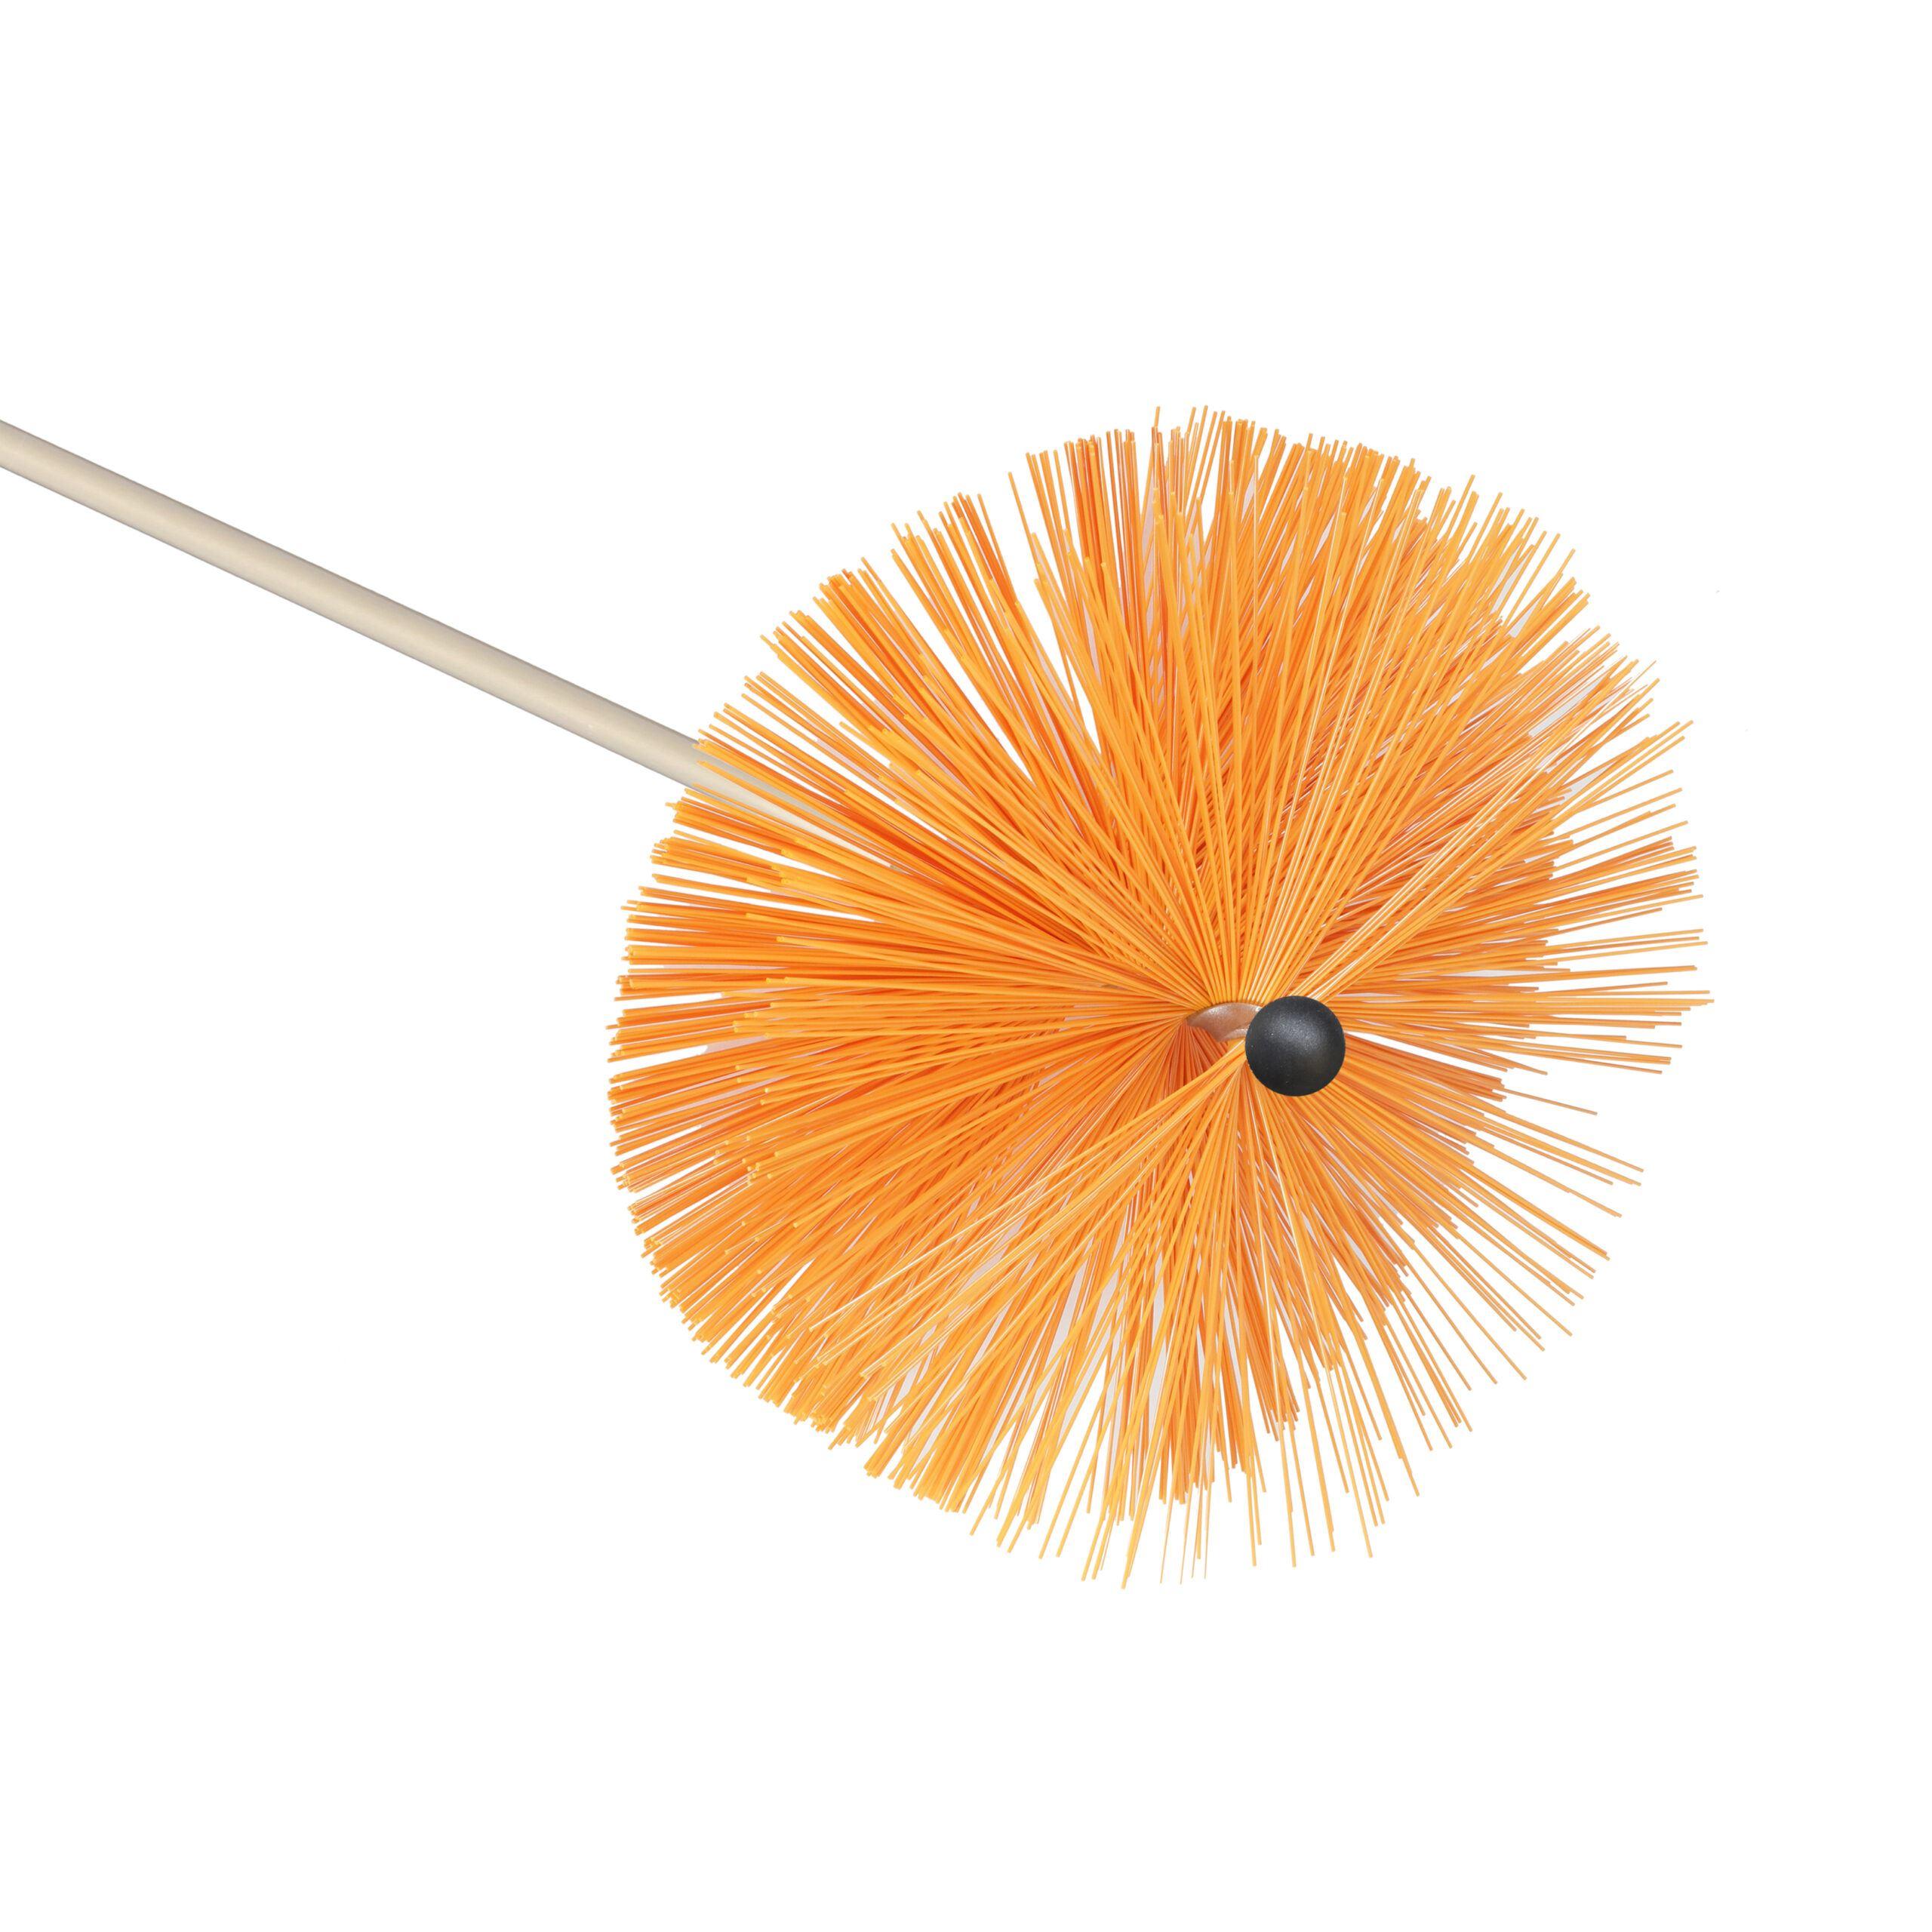 12″ Medium Bristle Chimney Brush